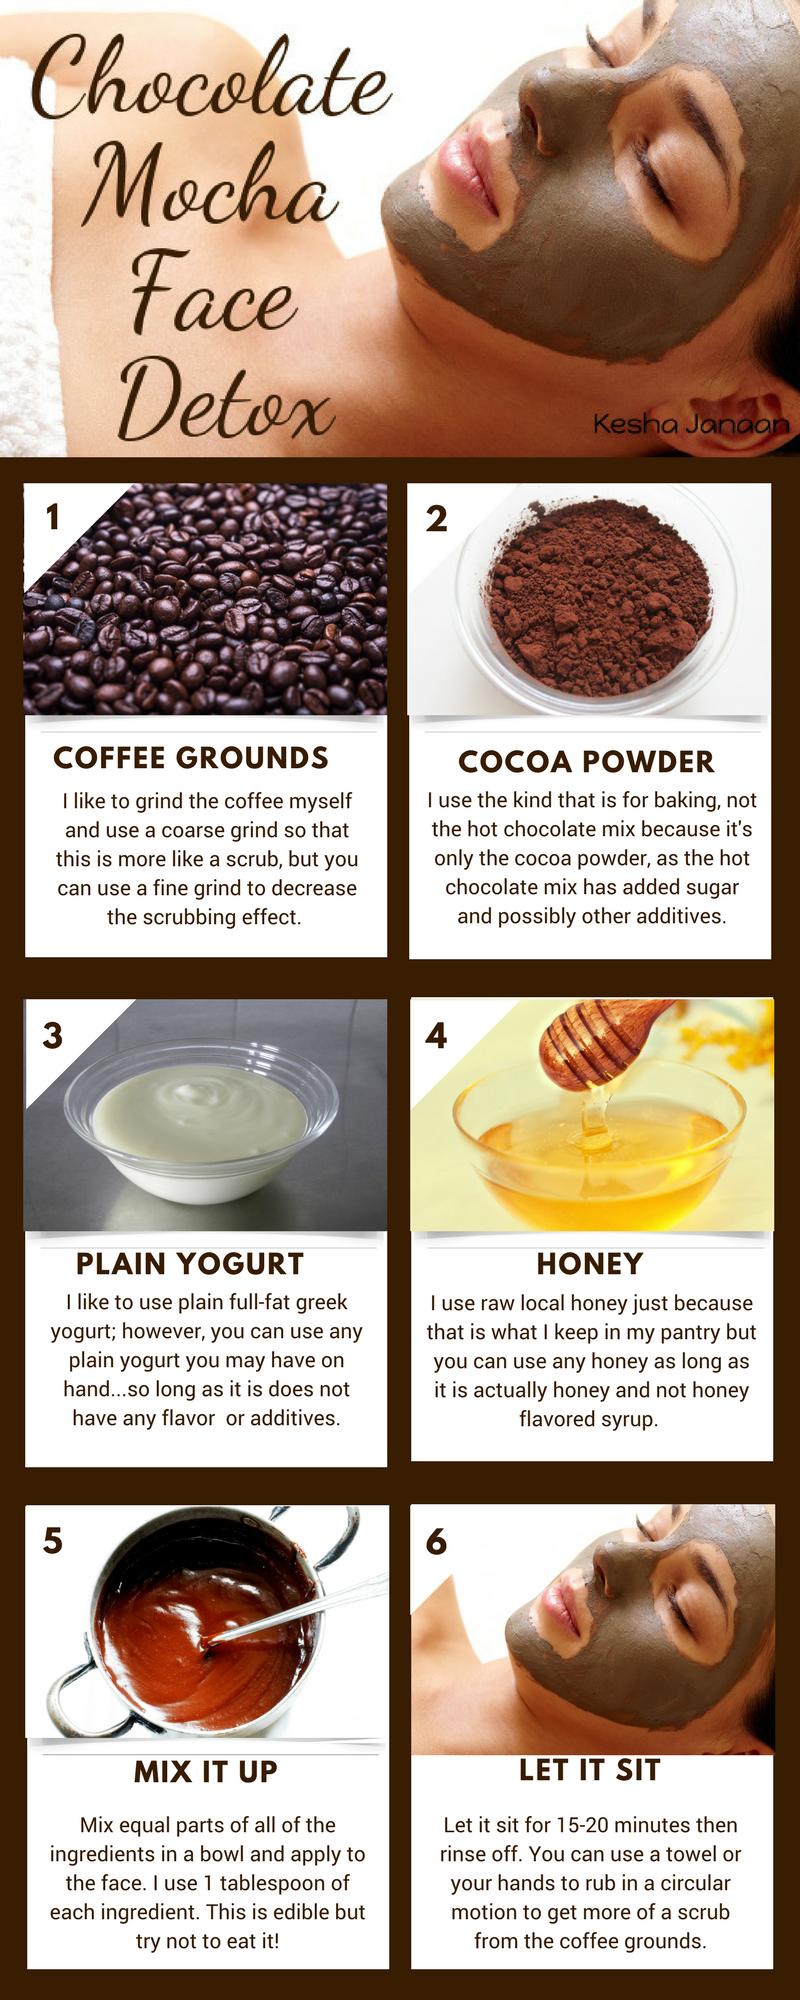 Chocolate Mocha Face Detox